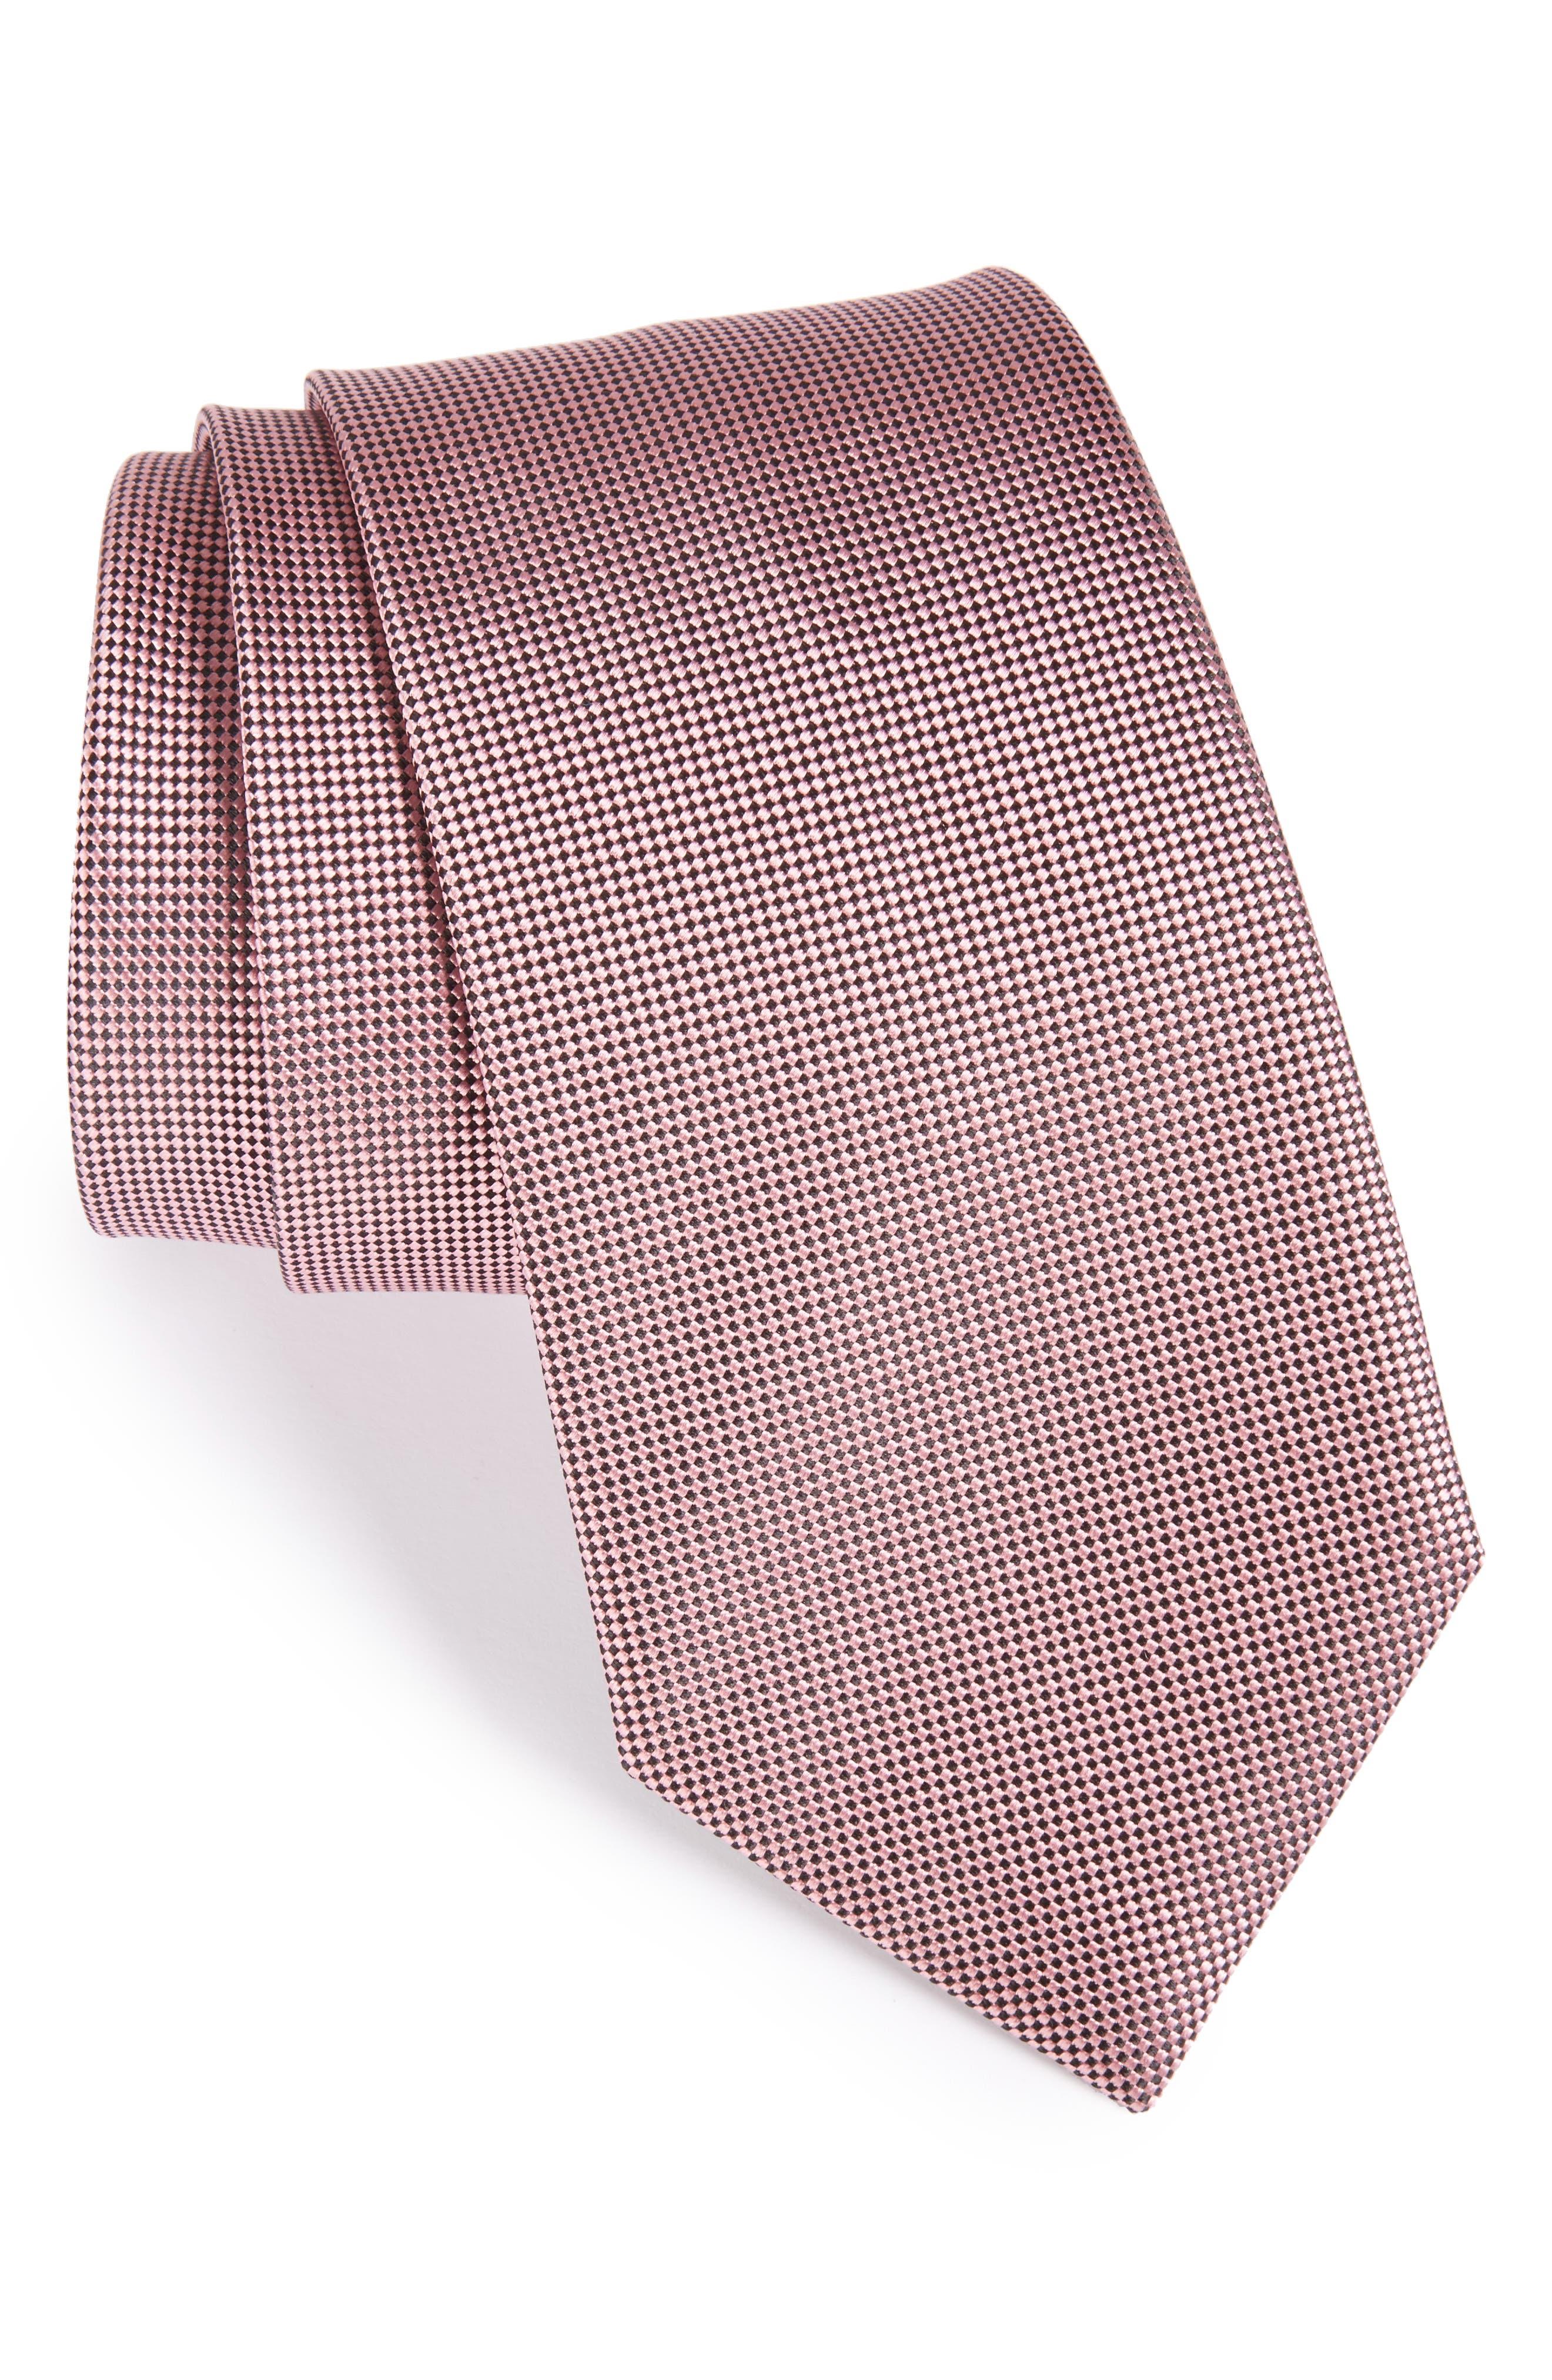 Alternate Image 1 Selected - Ermenegildo Zegna Geometric Silk Tie